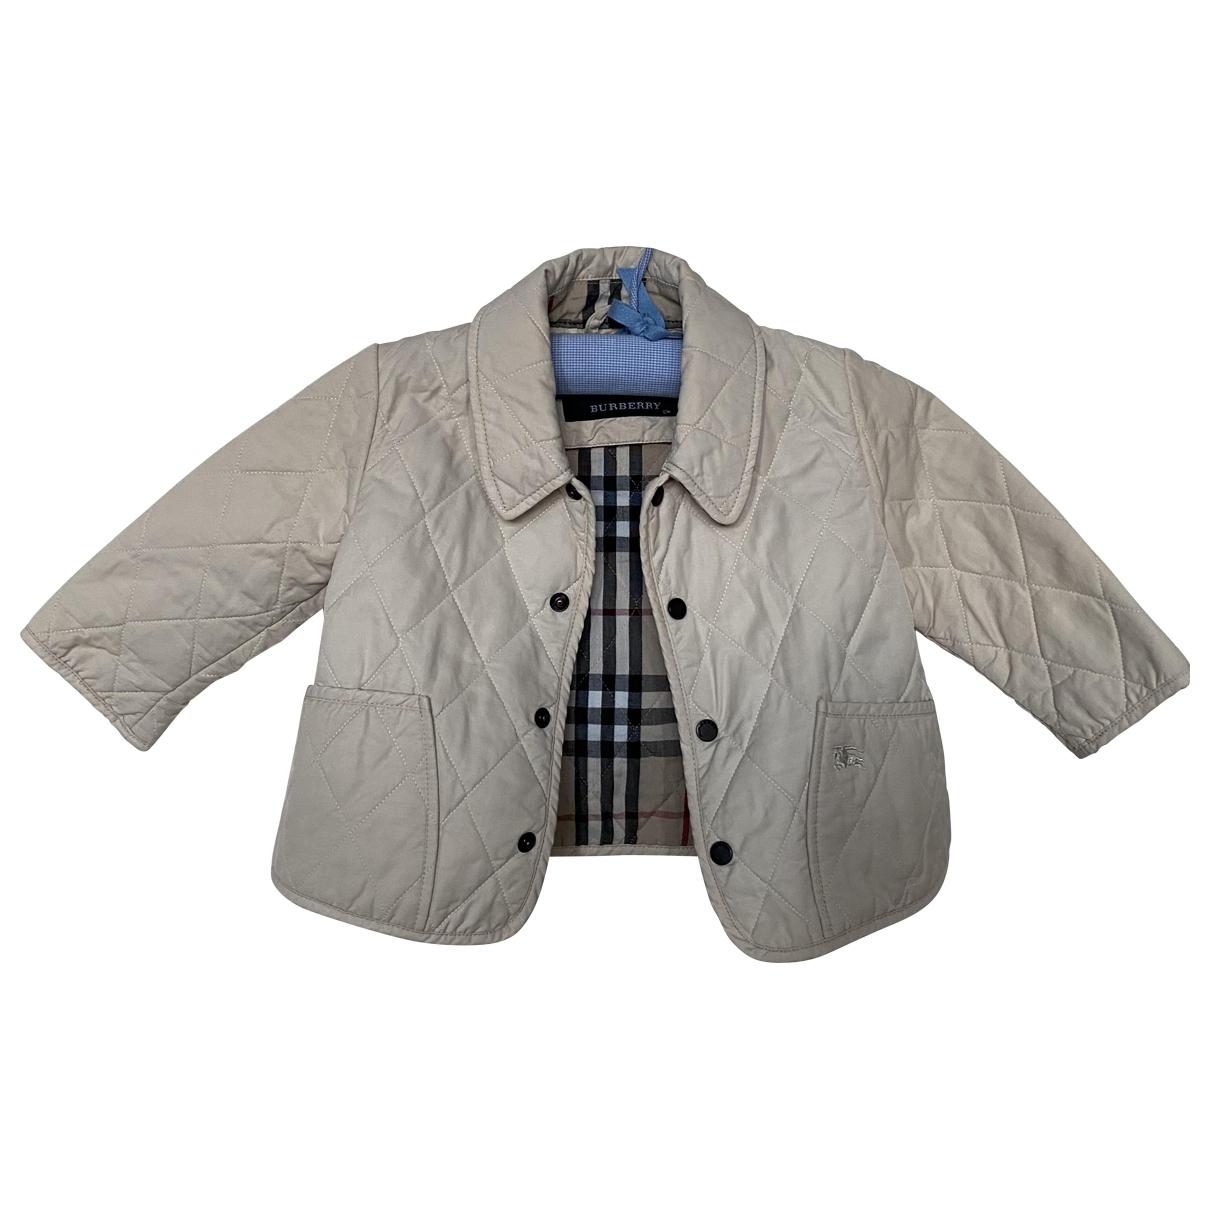 Burberry \N Beige Cotton jacket & coat for Kids 12 months - up to 74cm FR